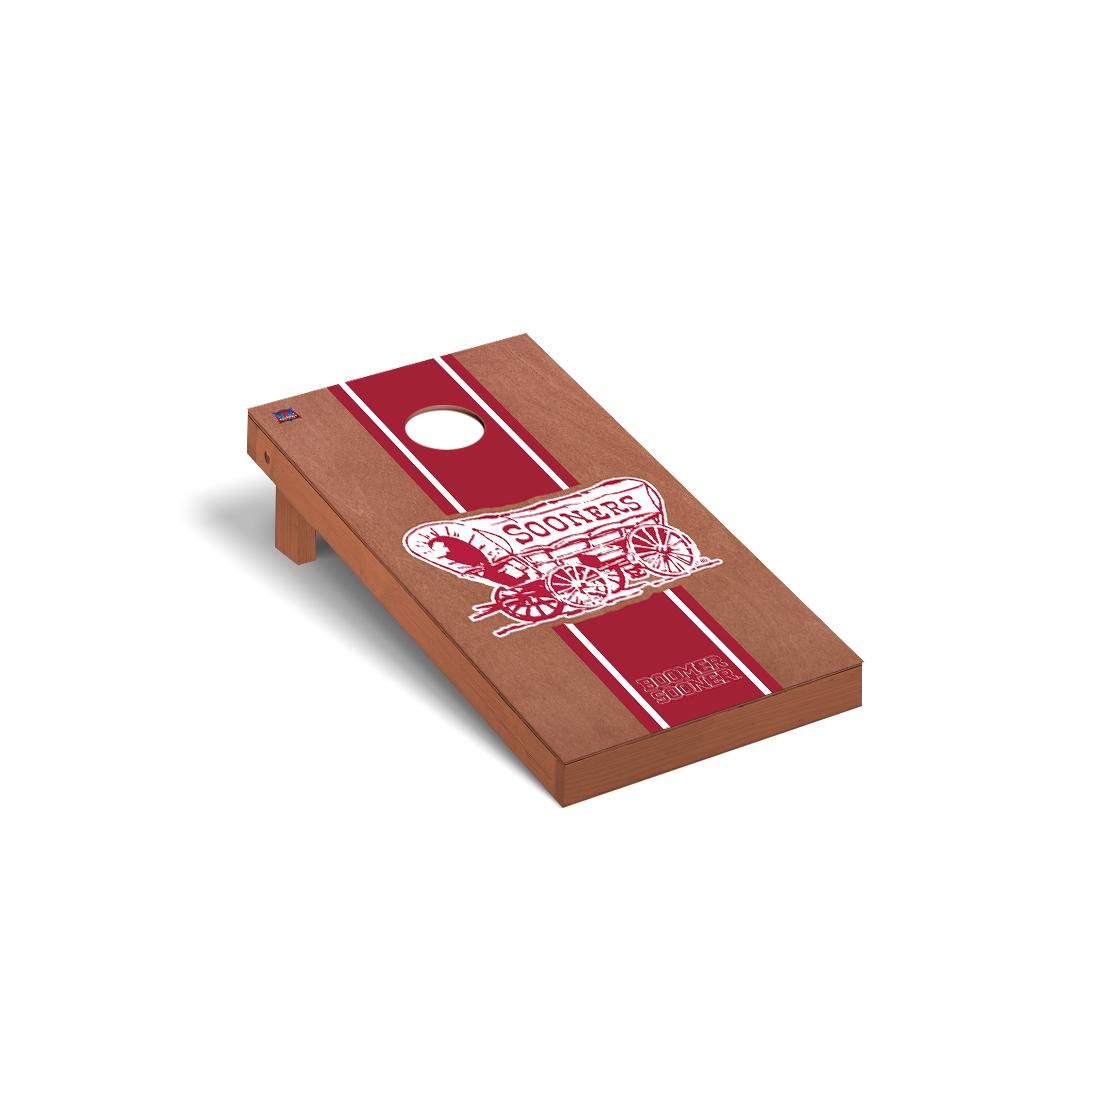 Oklahoma Sooners Cornhole Game Set Rosewood Stained Stripe Boomer Sooner Version